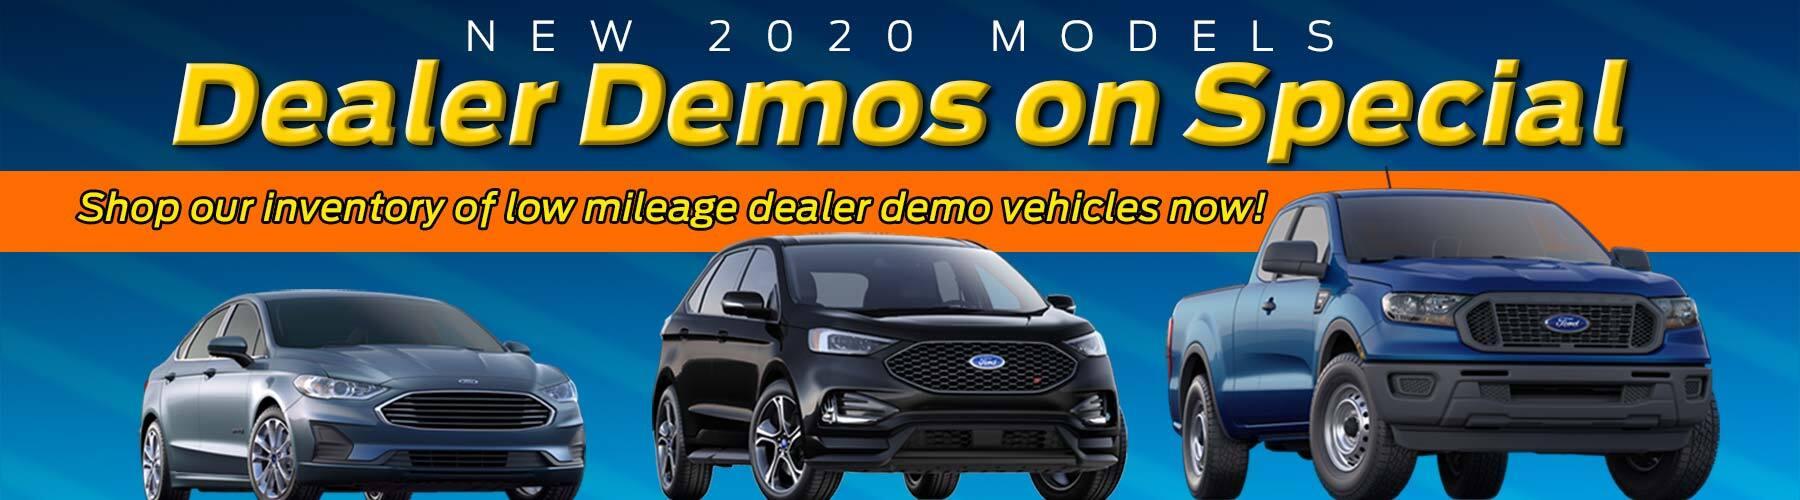 Dealer Demos